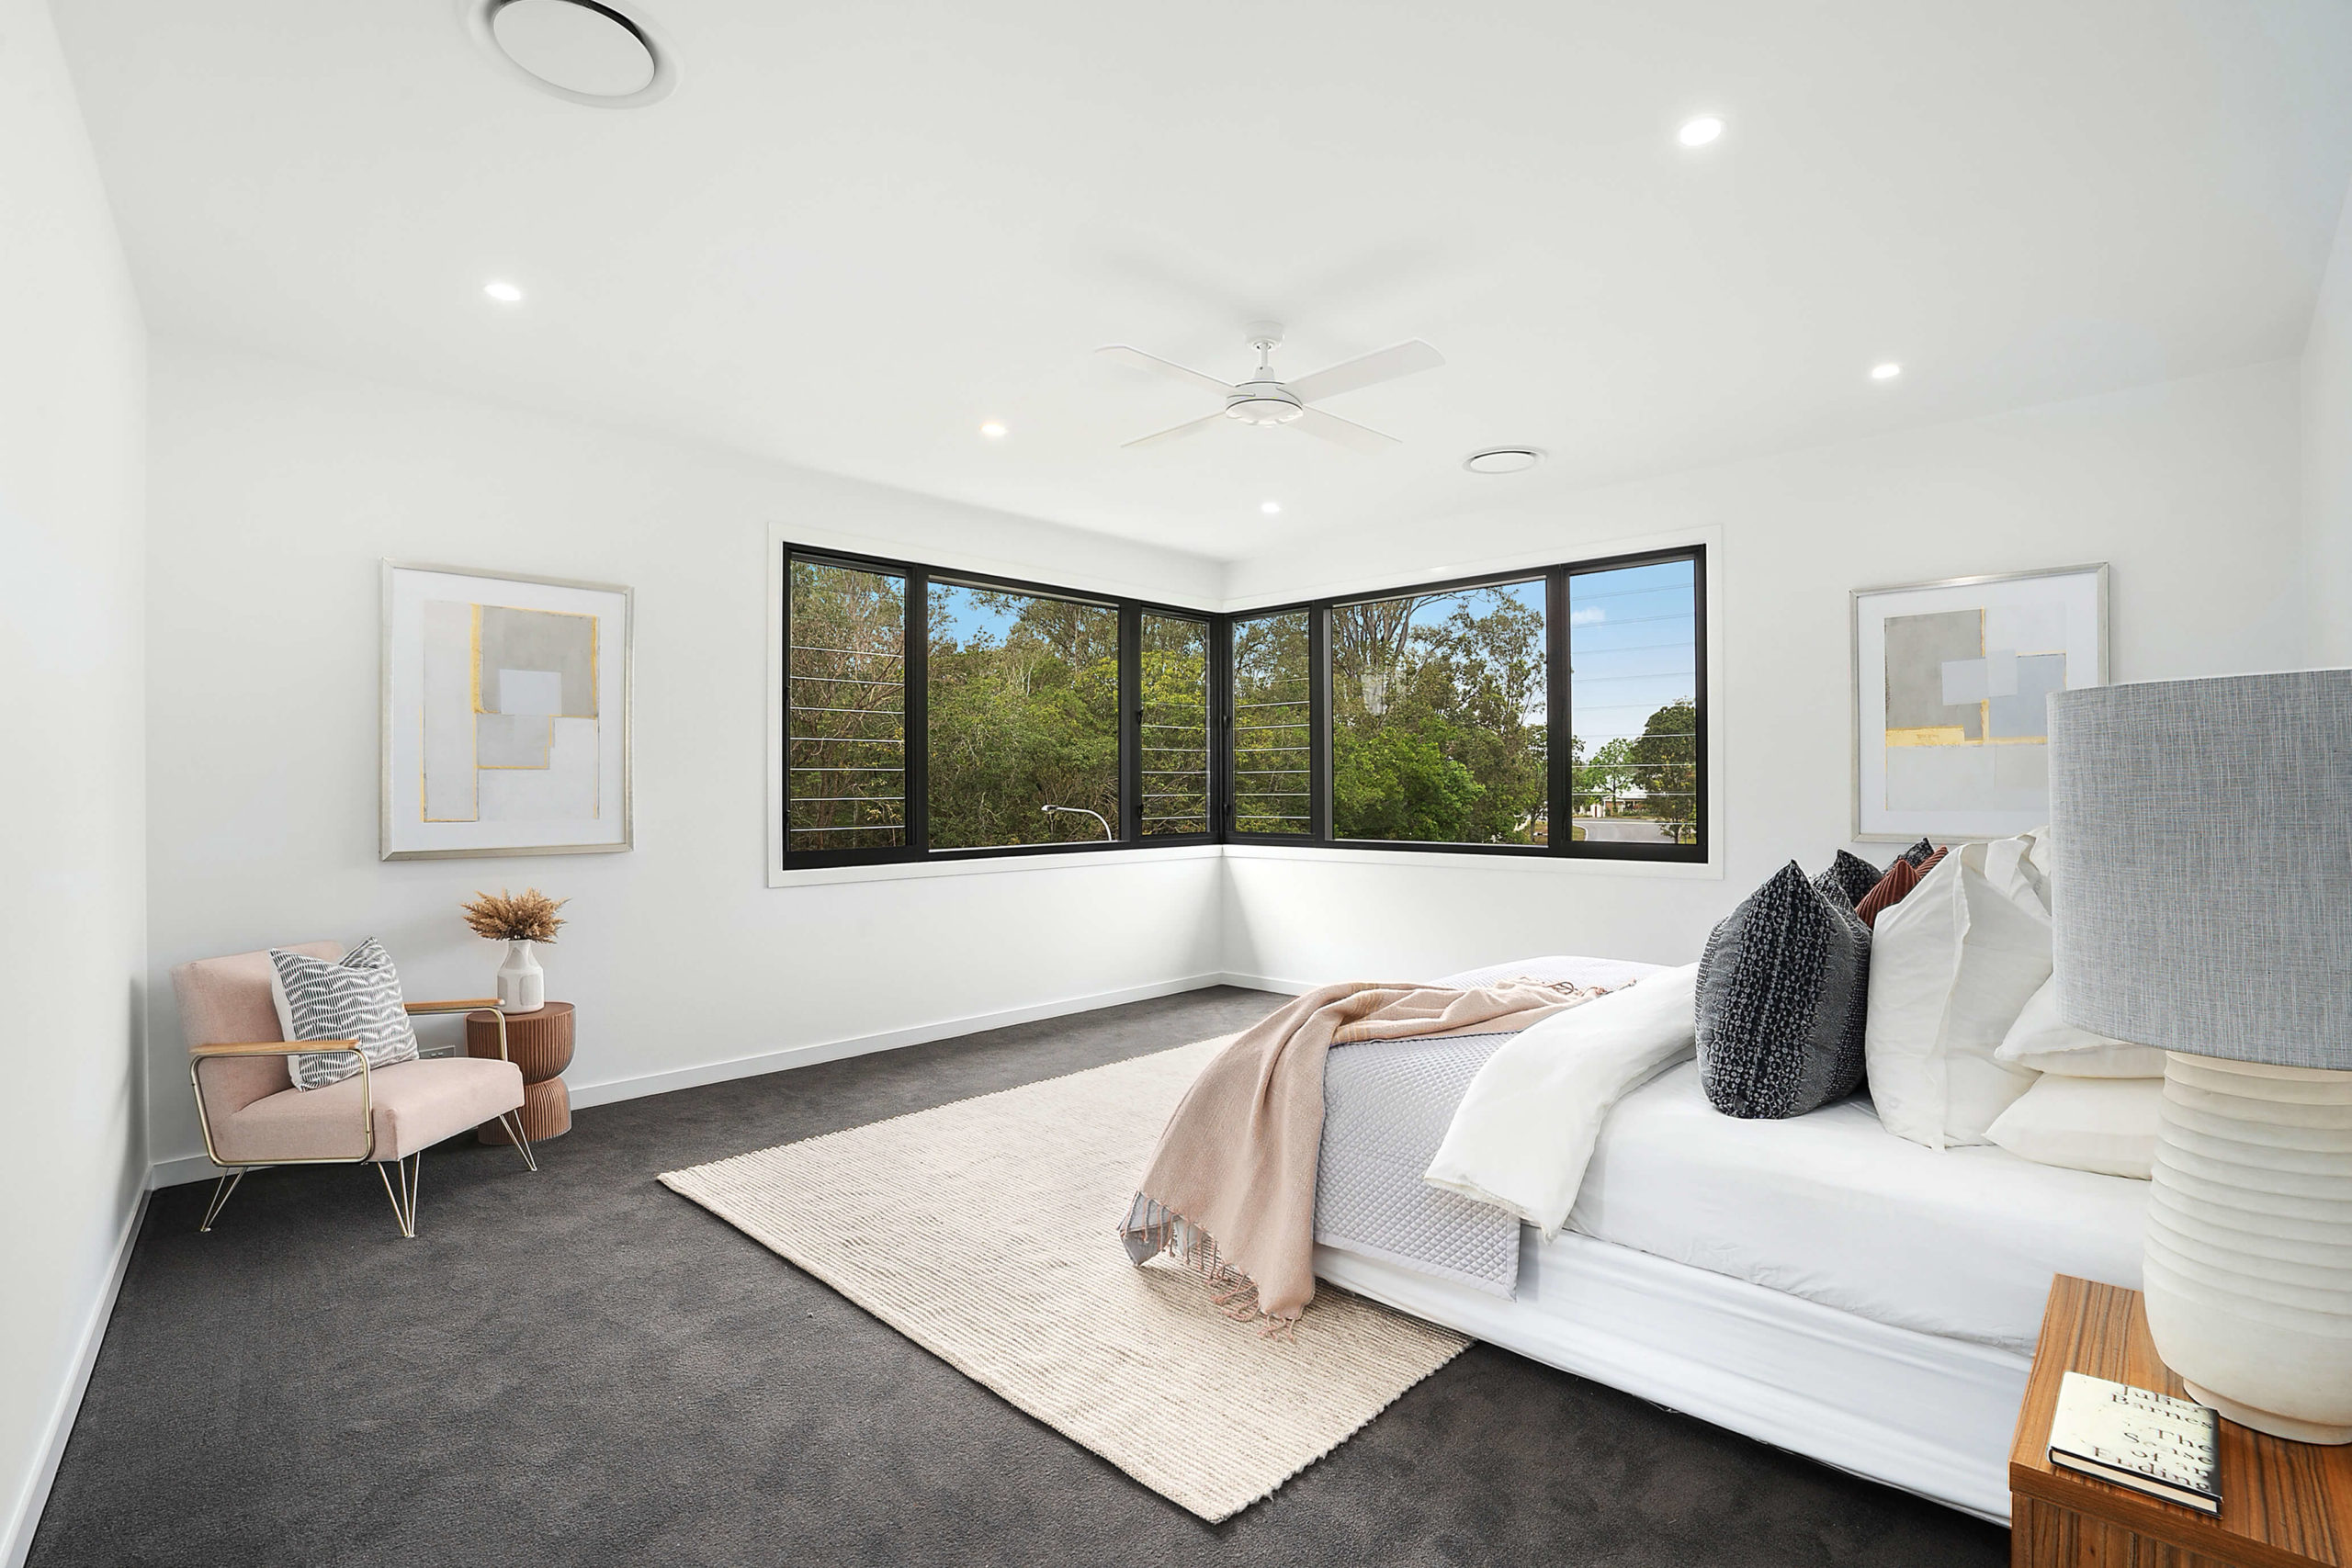 Ruth Miller Custom Home in Fig Tree Pocket